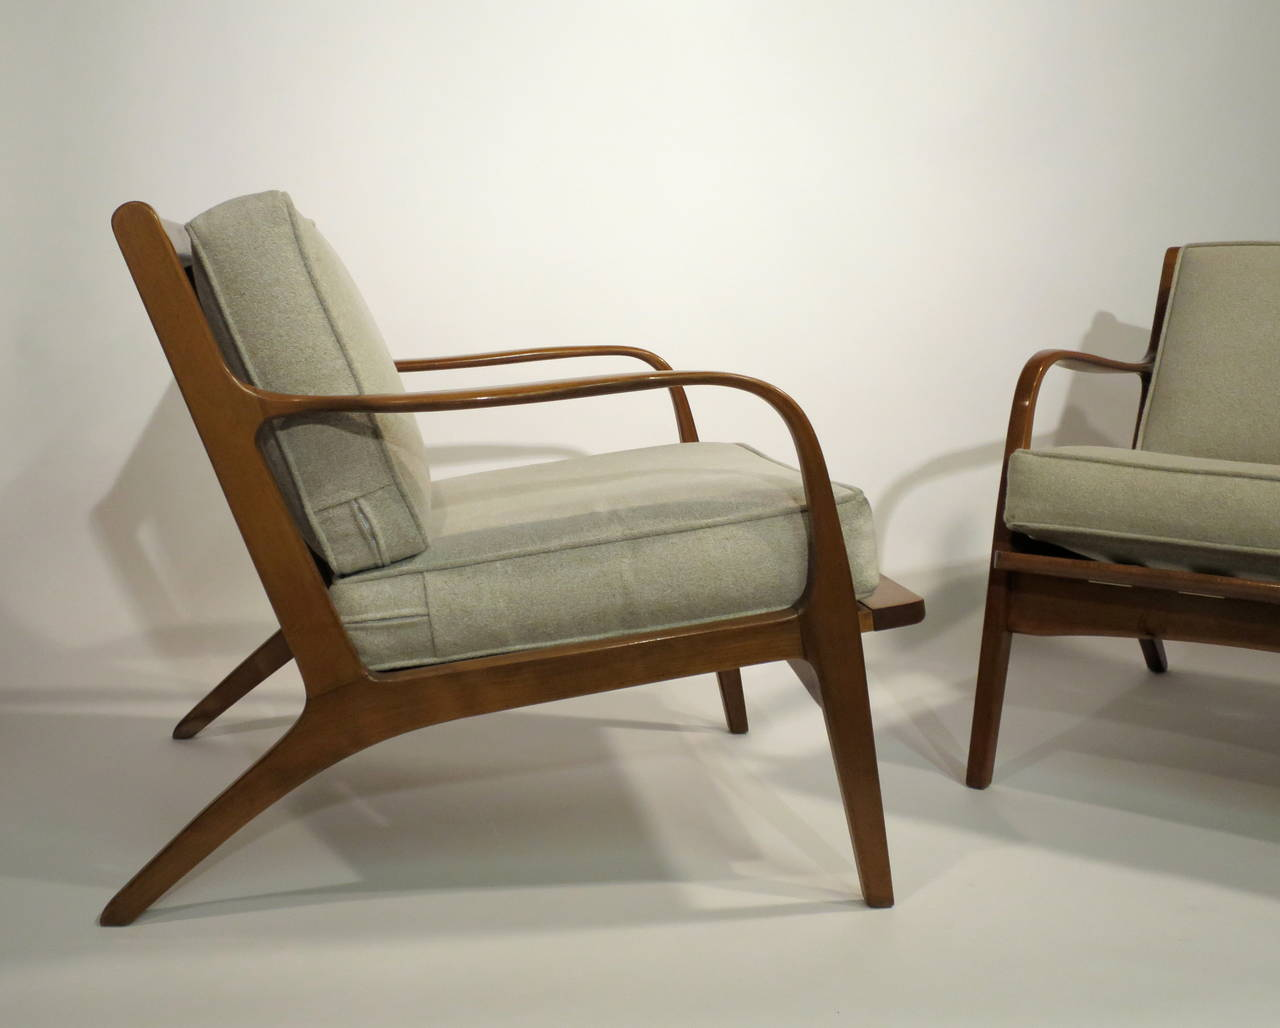 Pair of Danish Modern Lounge Chairs at 1stdibs